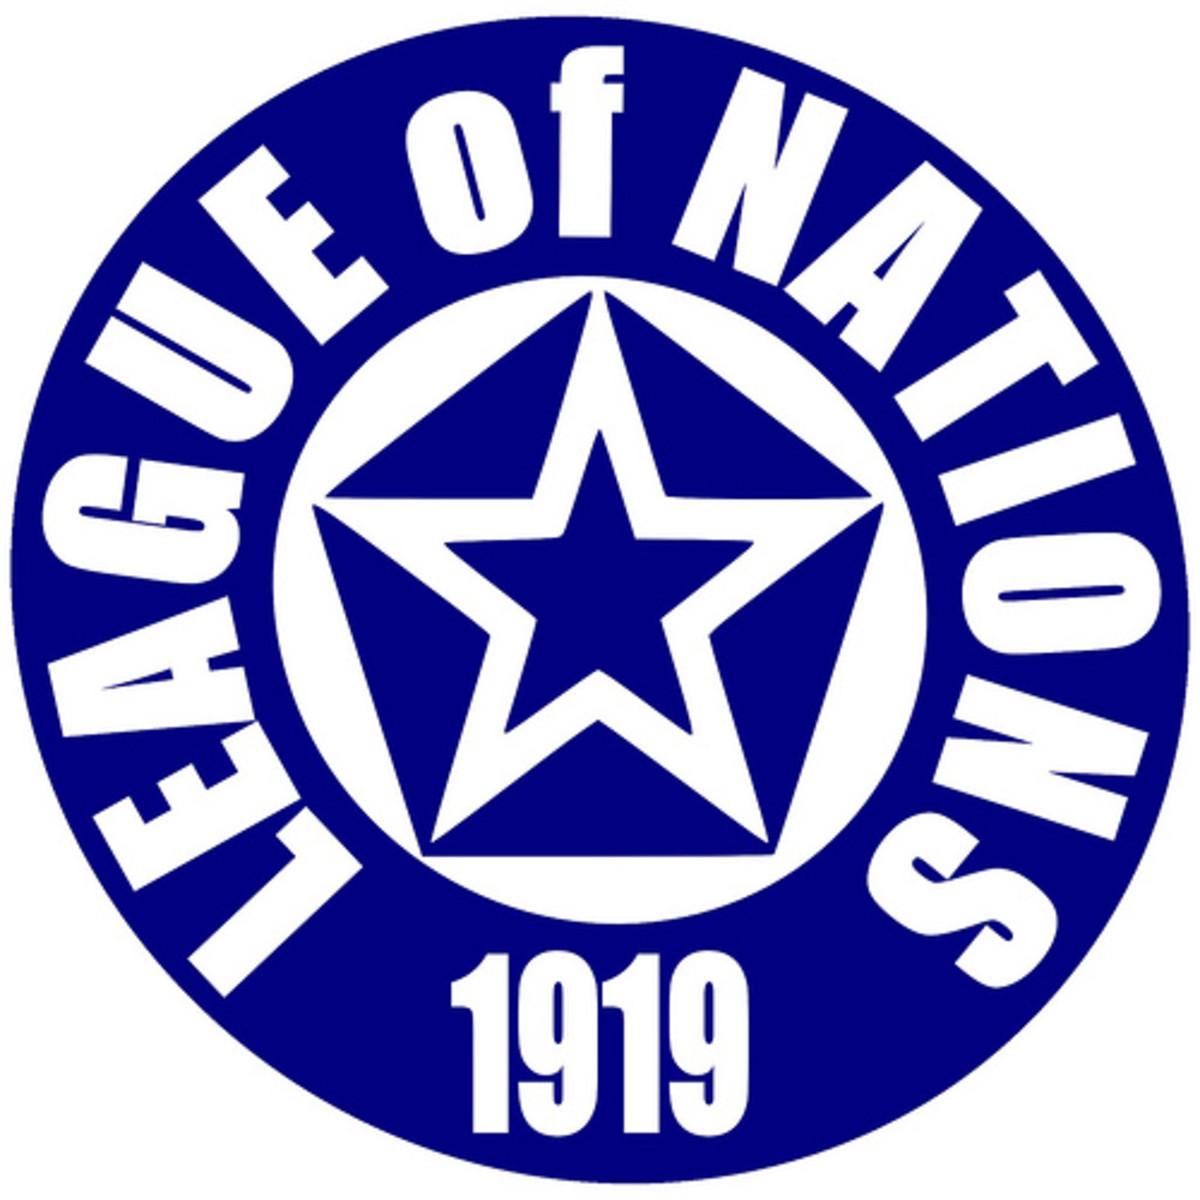 The Emblem of the League